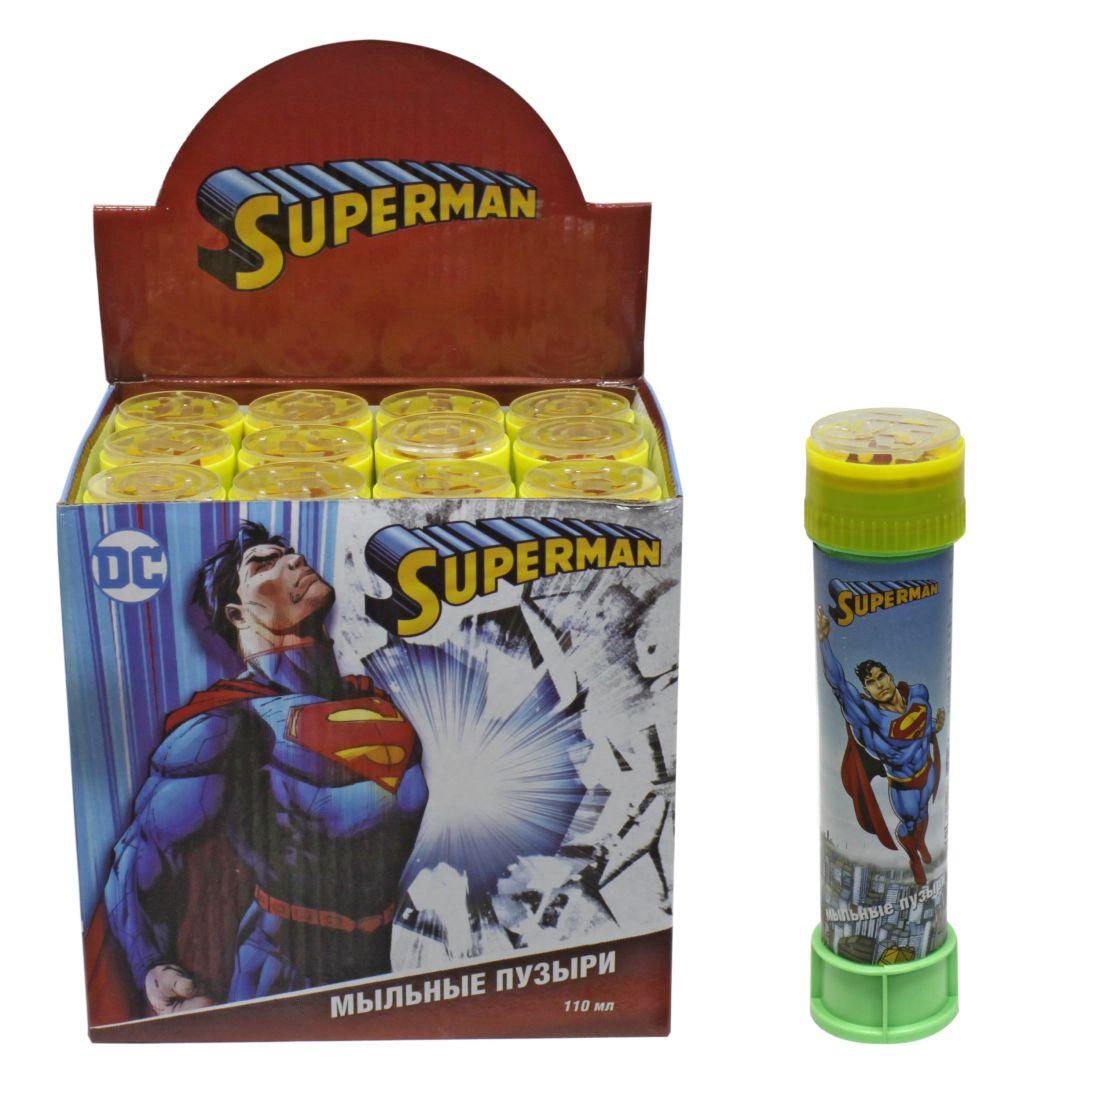 1toy Superman, мыльные пузыри, бут. 110 мл